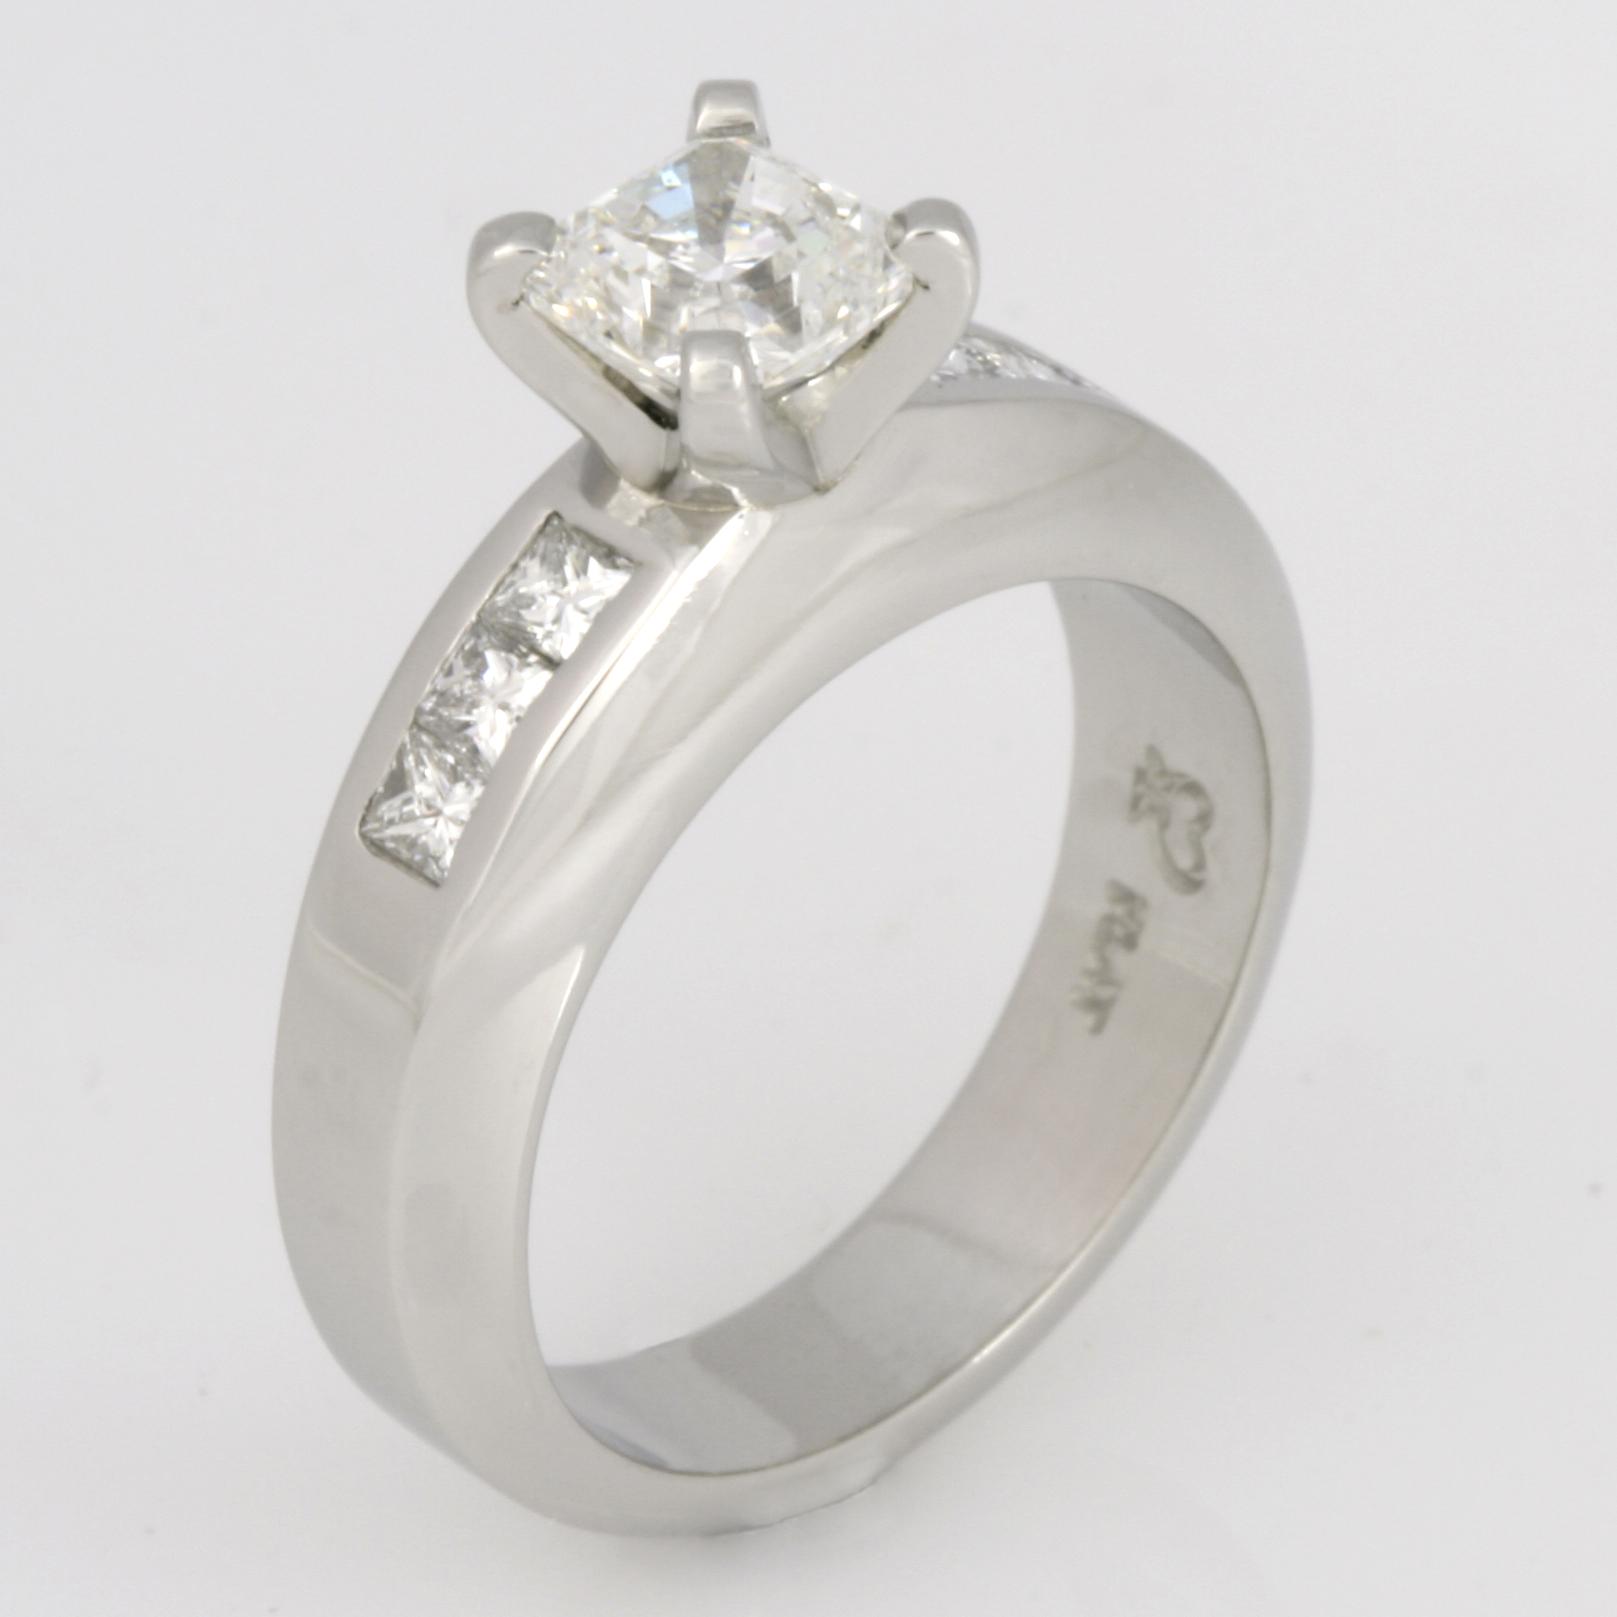 Handmade ladies platinum 'Evolution' cut diamond engagement ring